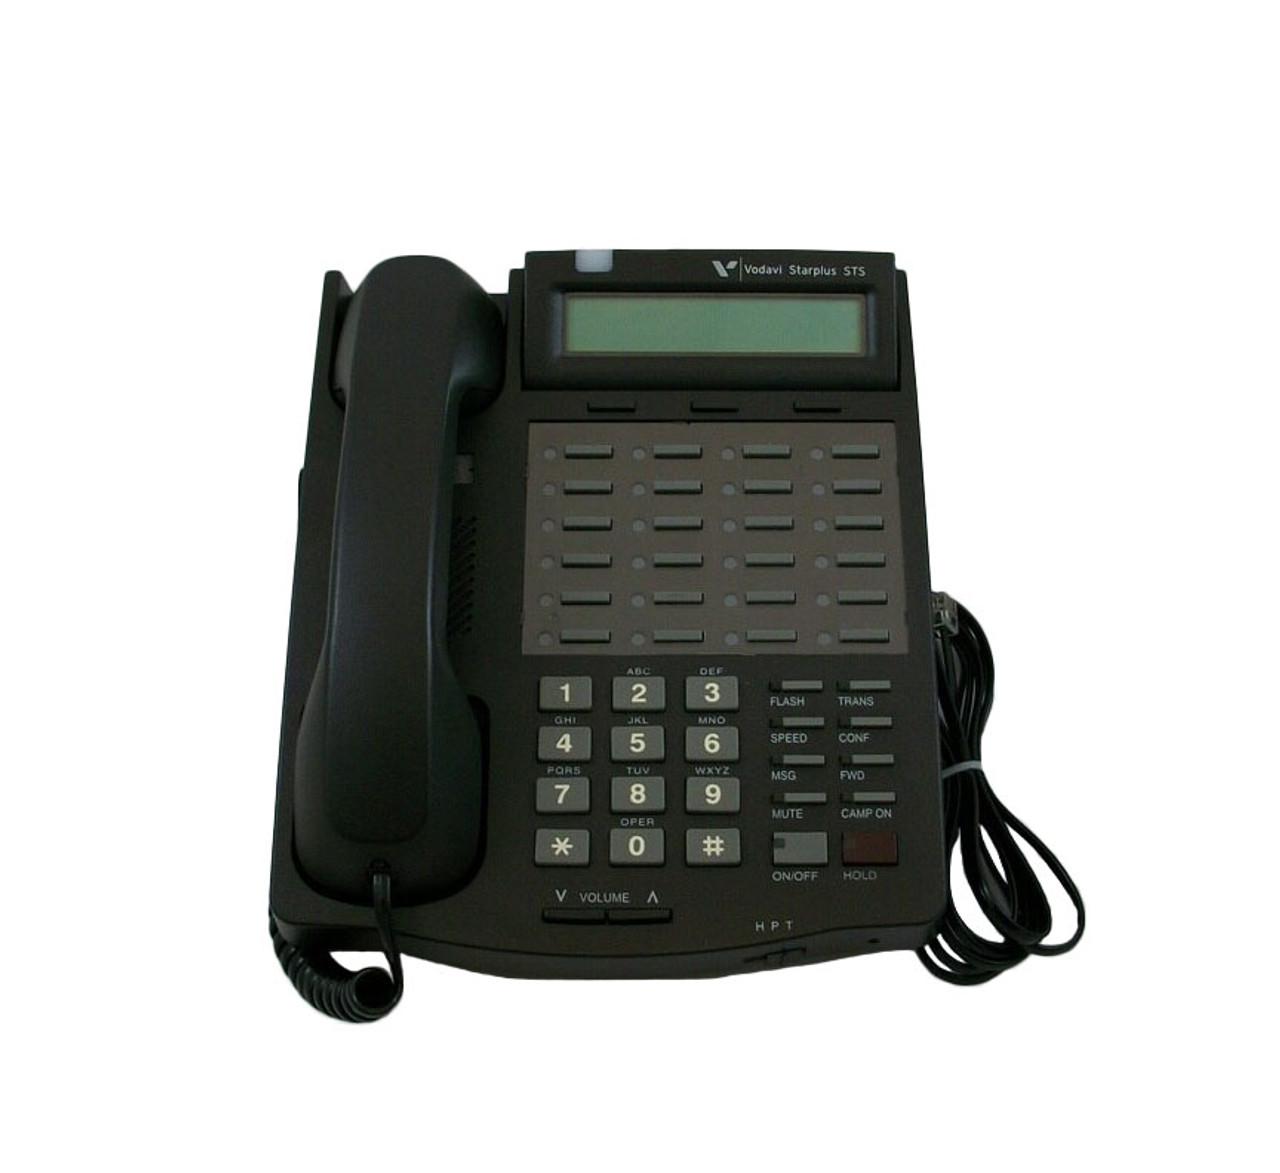 Vodavi Starplus STS 24-Button Phone SP-3515-71